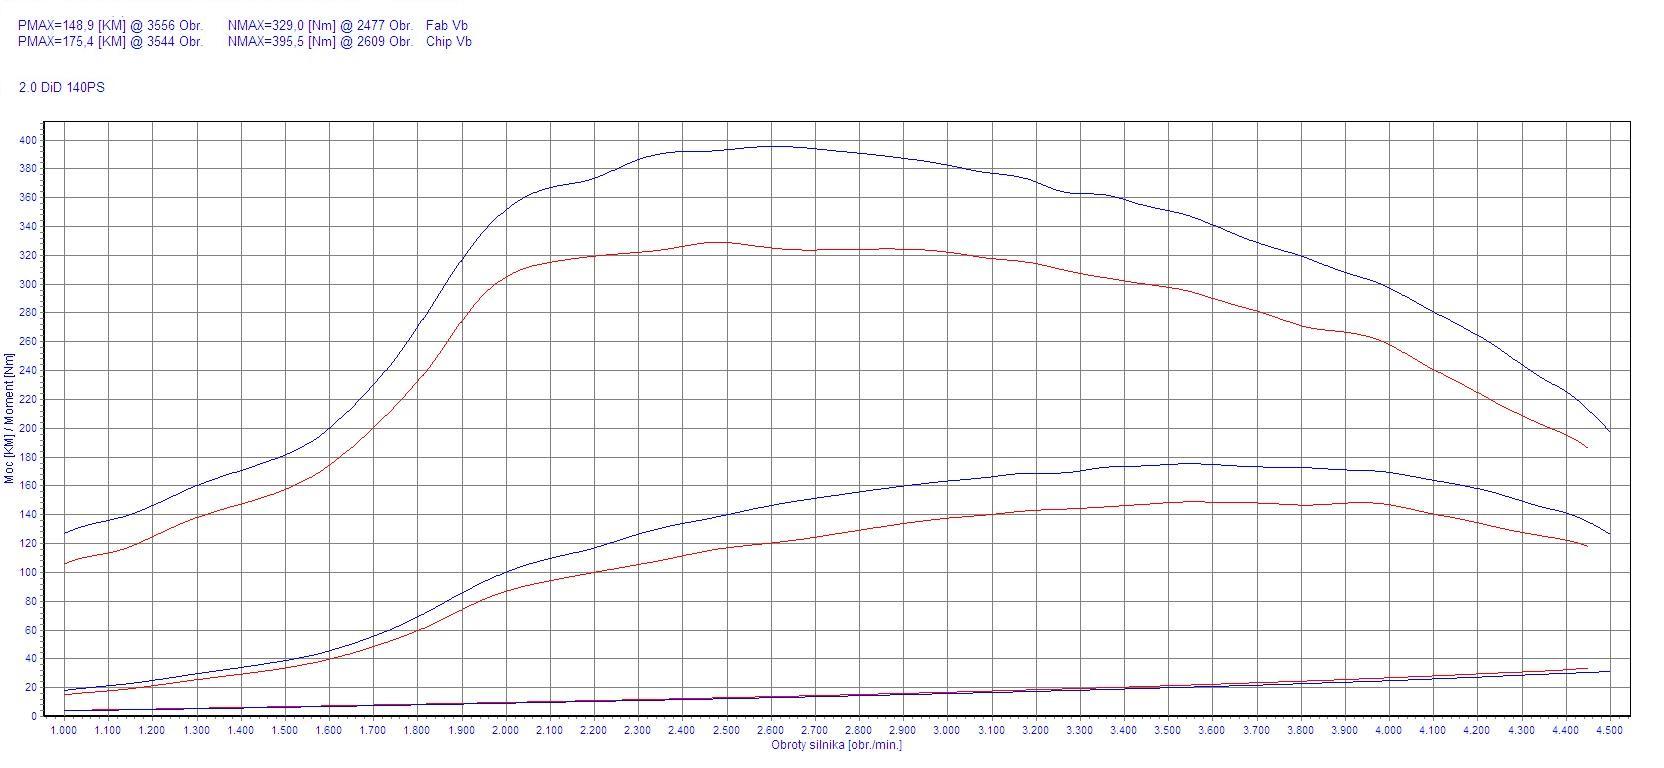 Chip Tuning Mitsubishi Lancer 2.0 DI-D 103kW 138HP